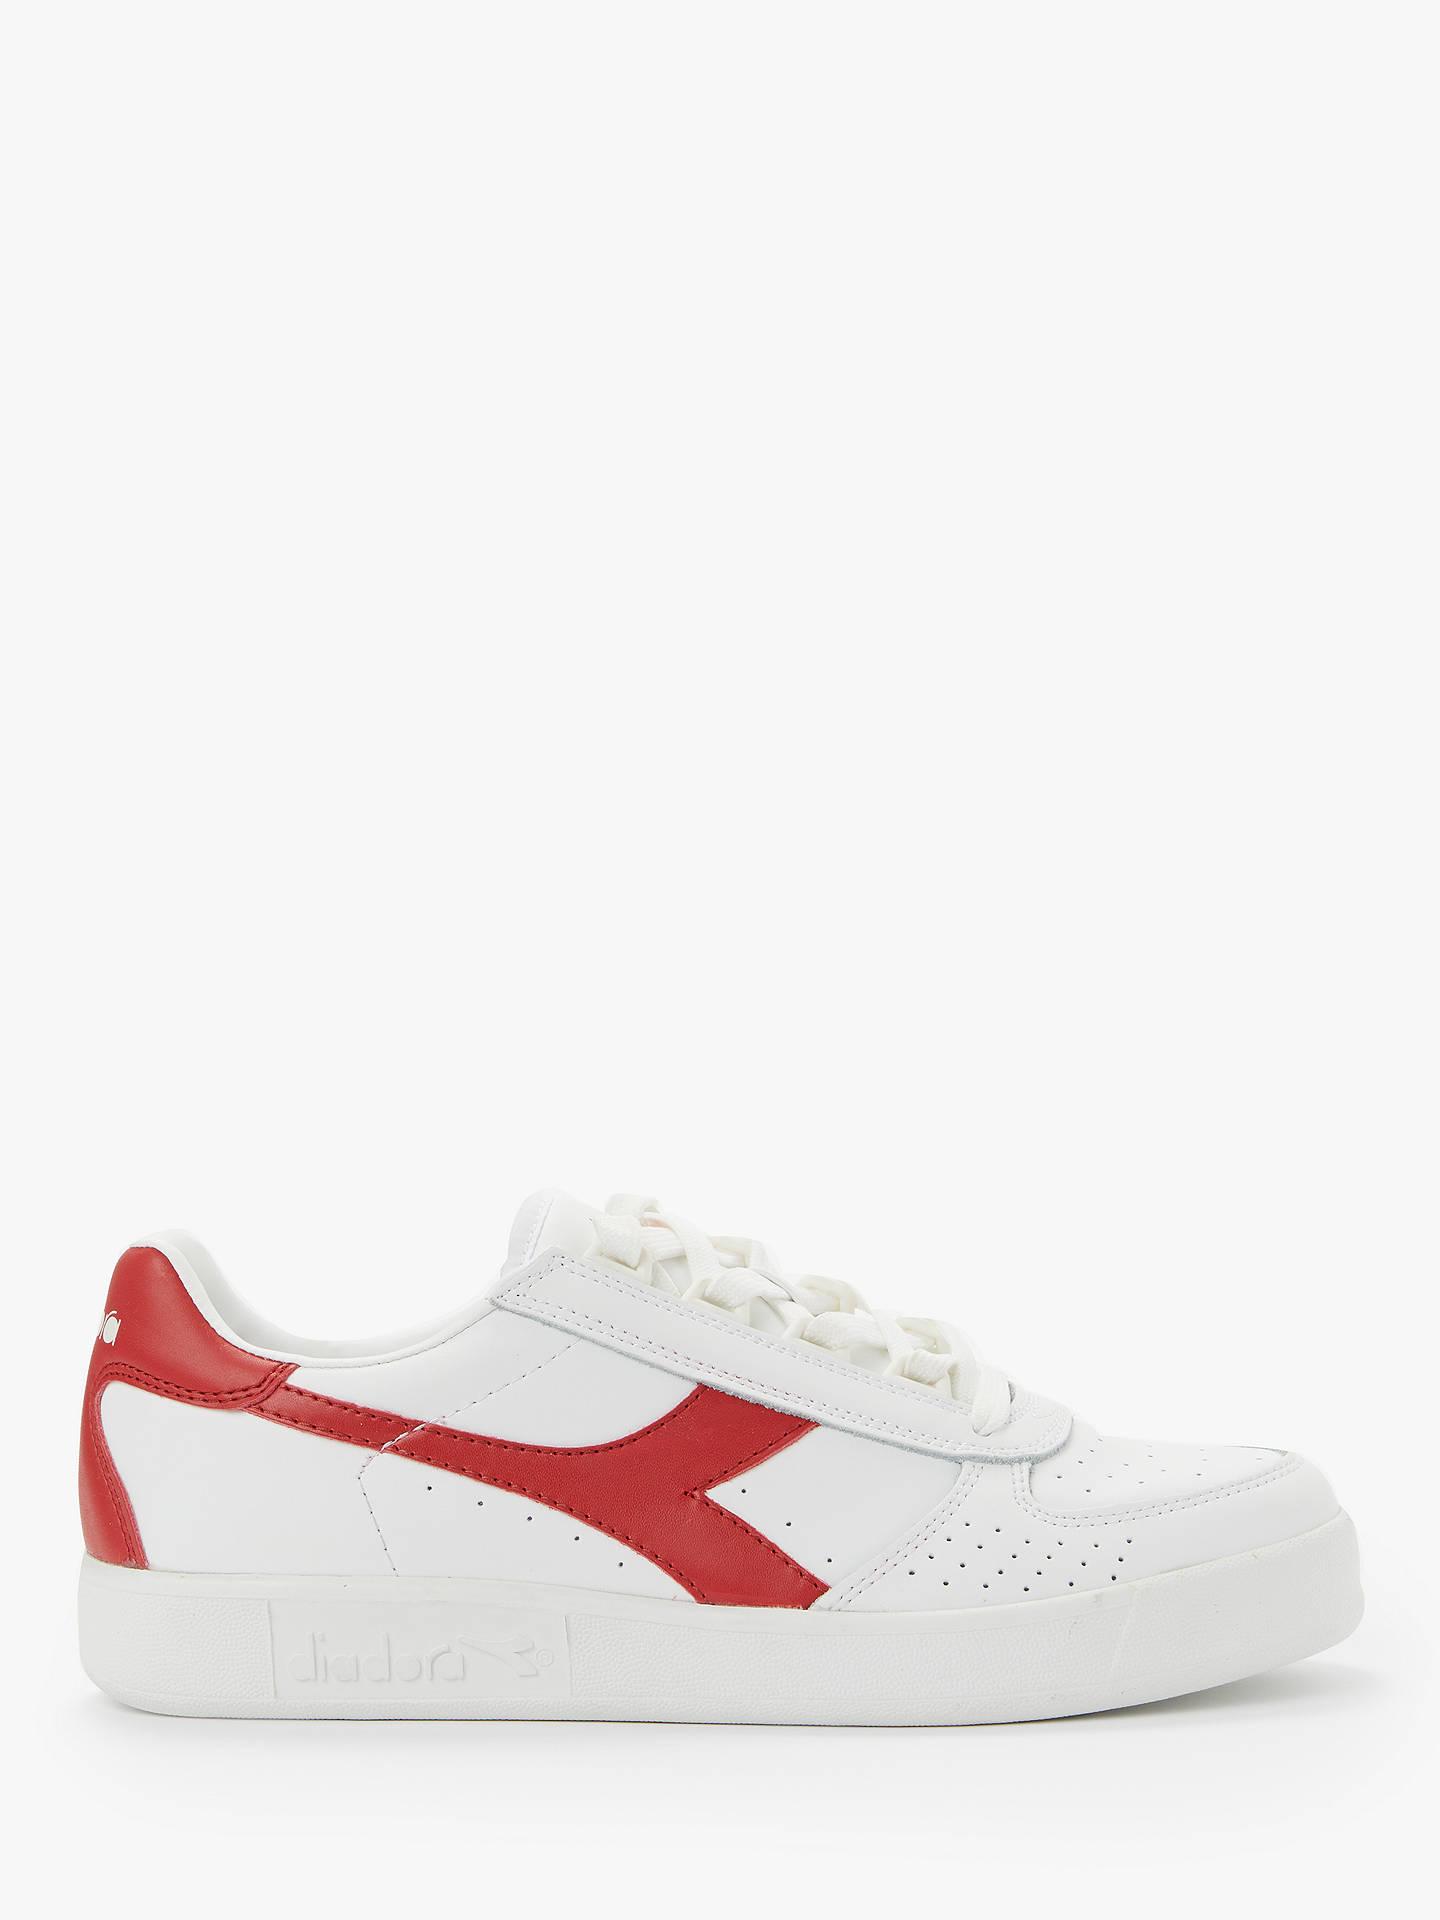 d805b8eb Diadora B.Elite Leather Trainers, White/Ferrari Red